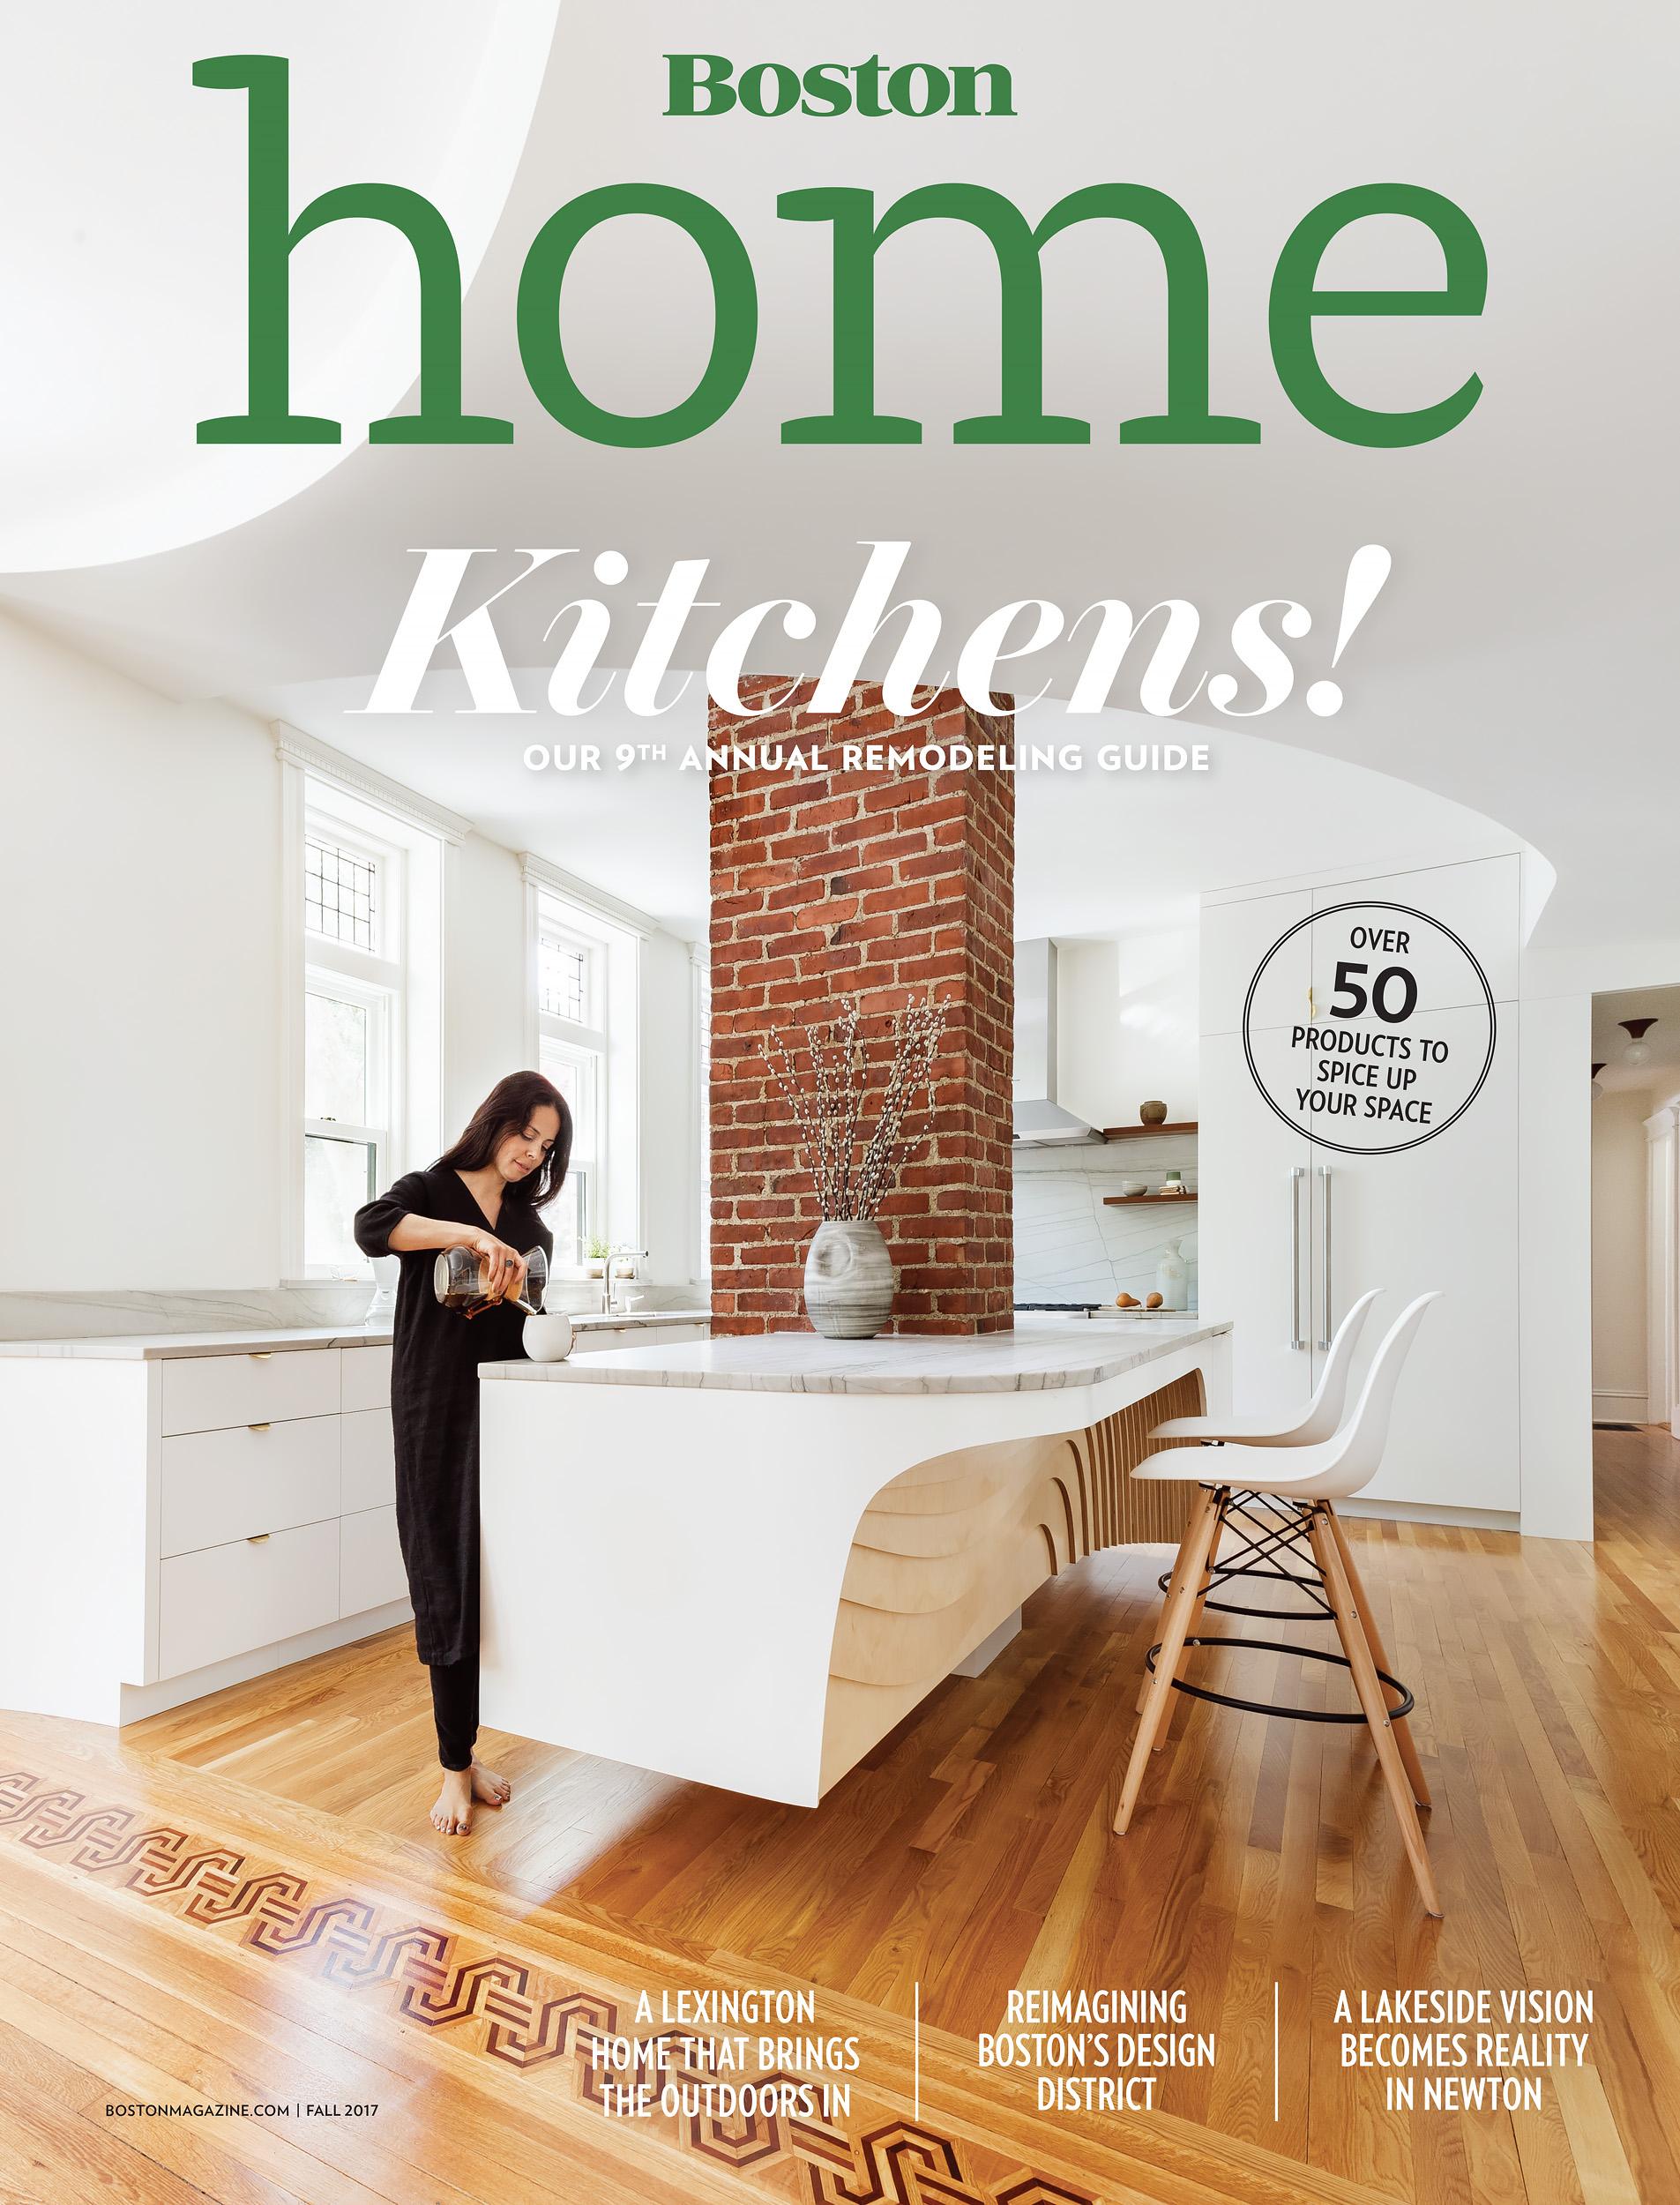 Boston Home - Kitchens 2017 Cover